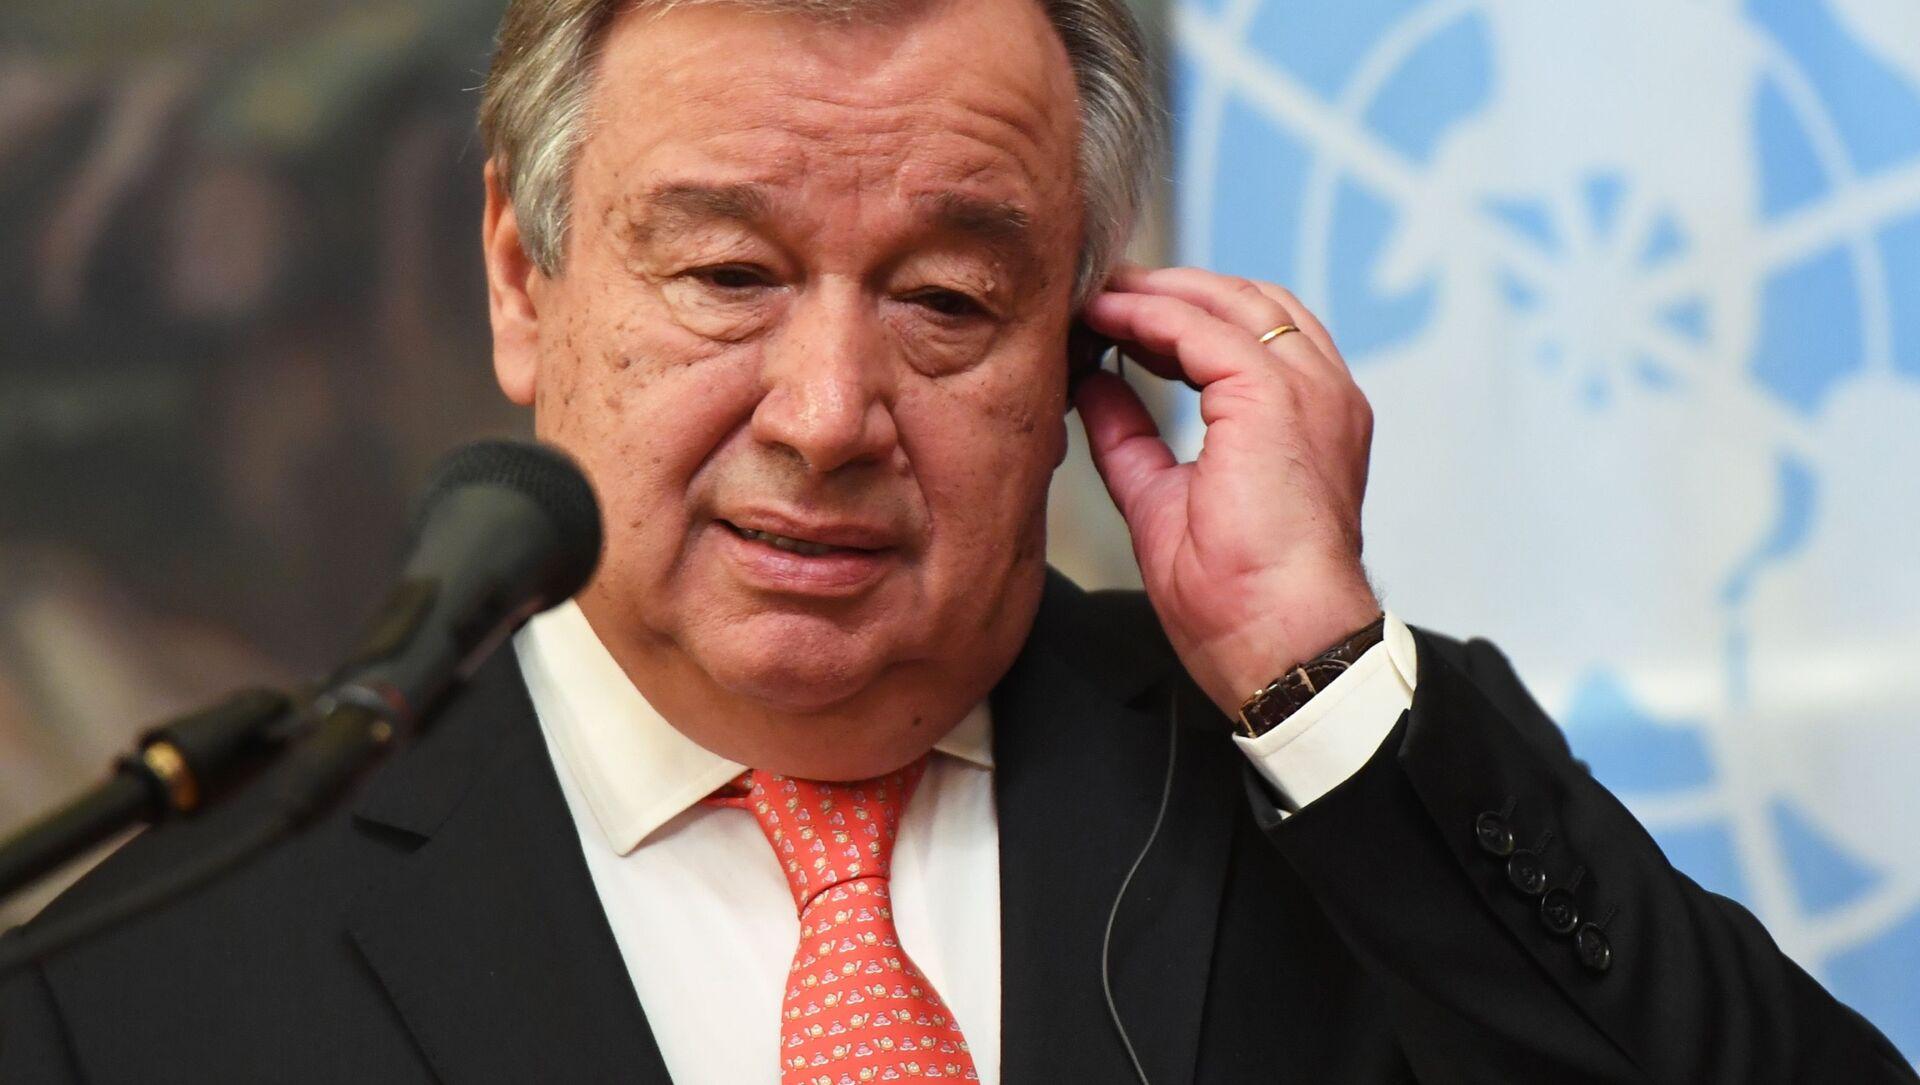 Sekretarz Generalny ONZ Antonio Guterres - Sputnik Polska, 1920, 18.06.2021